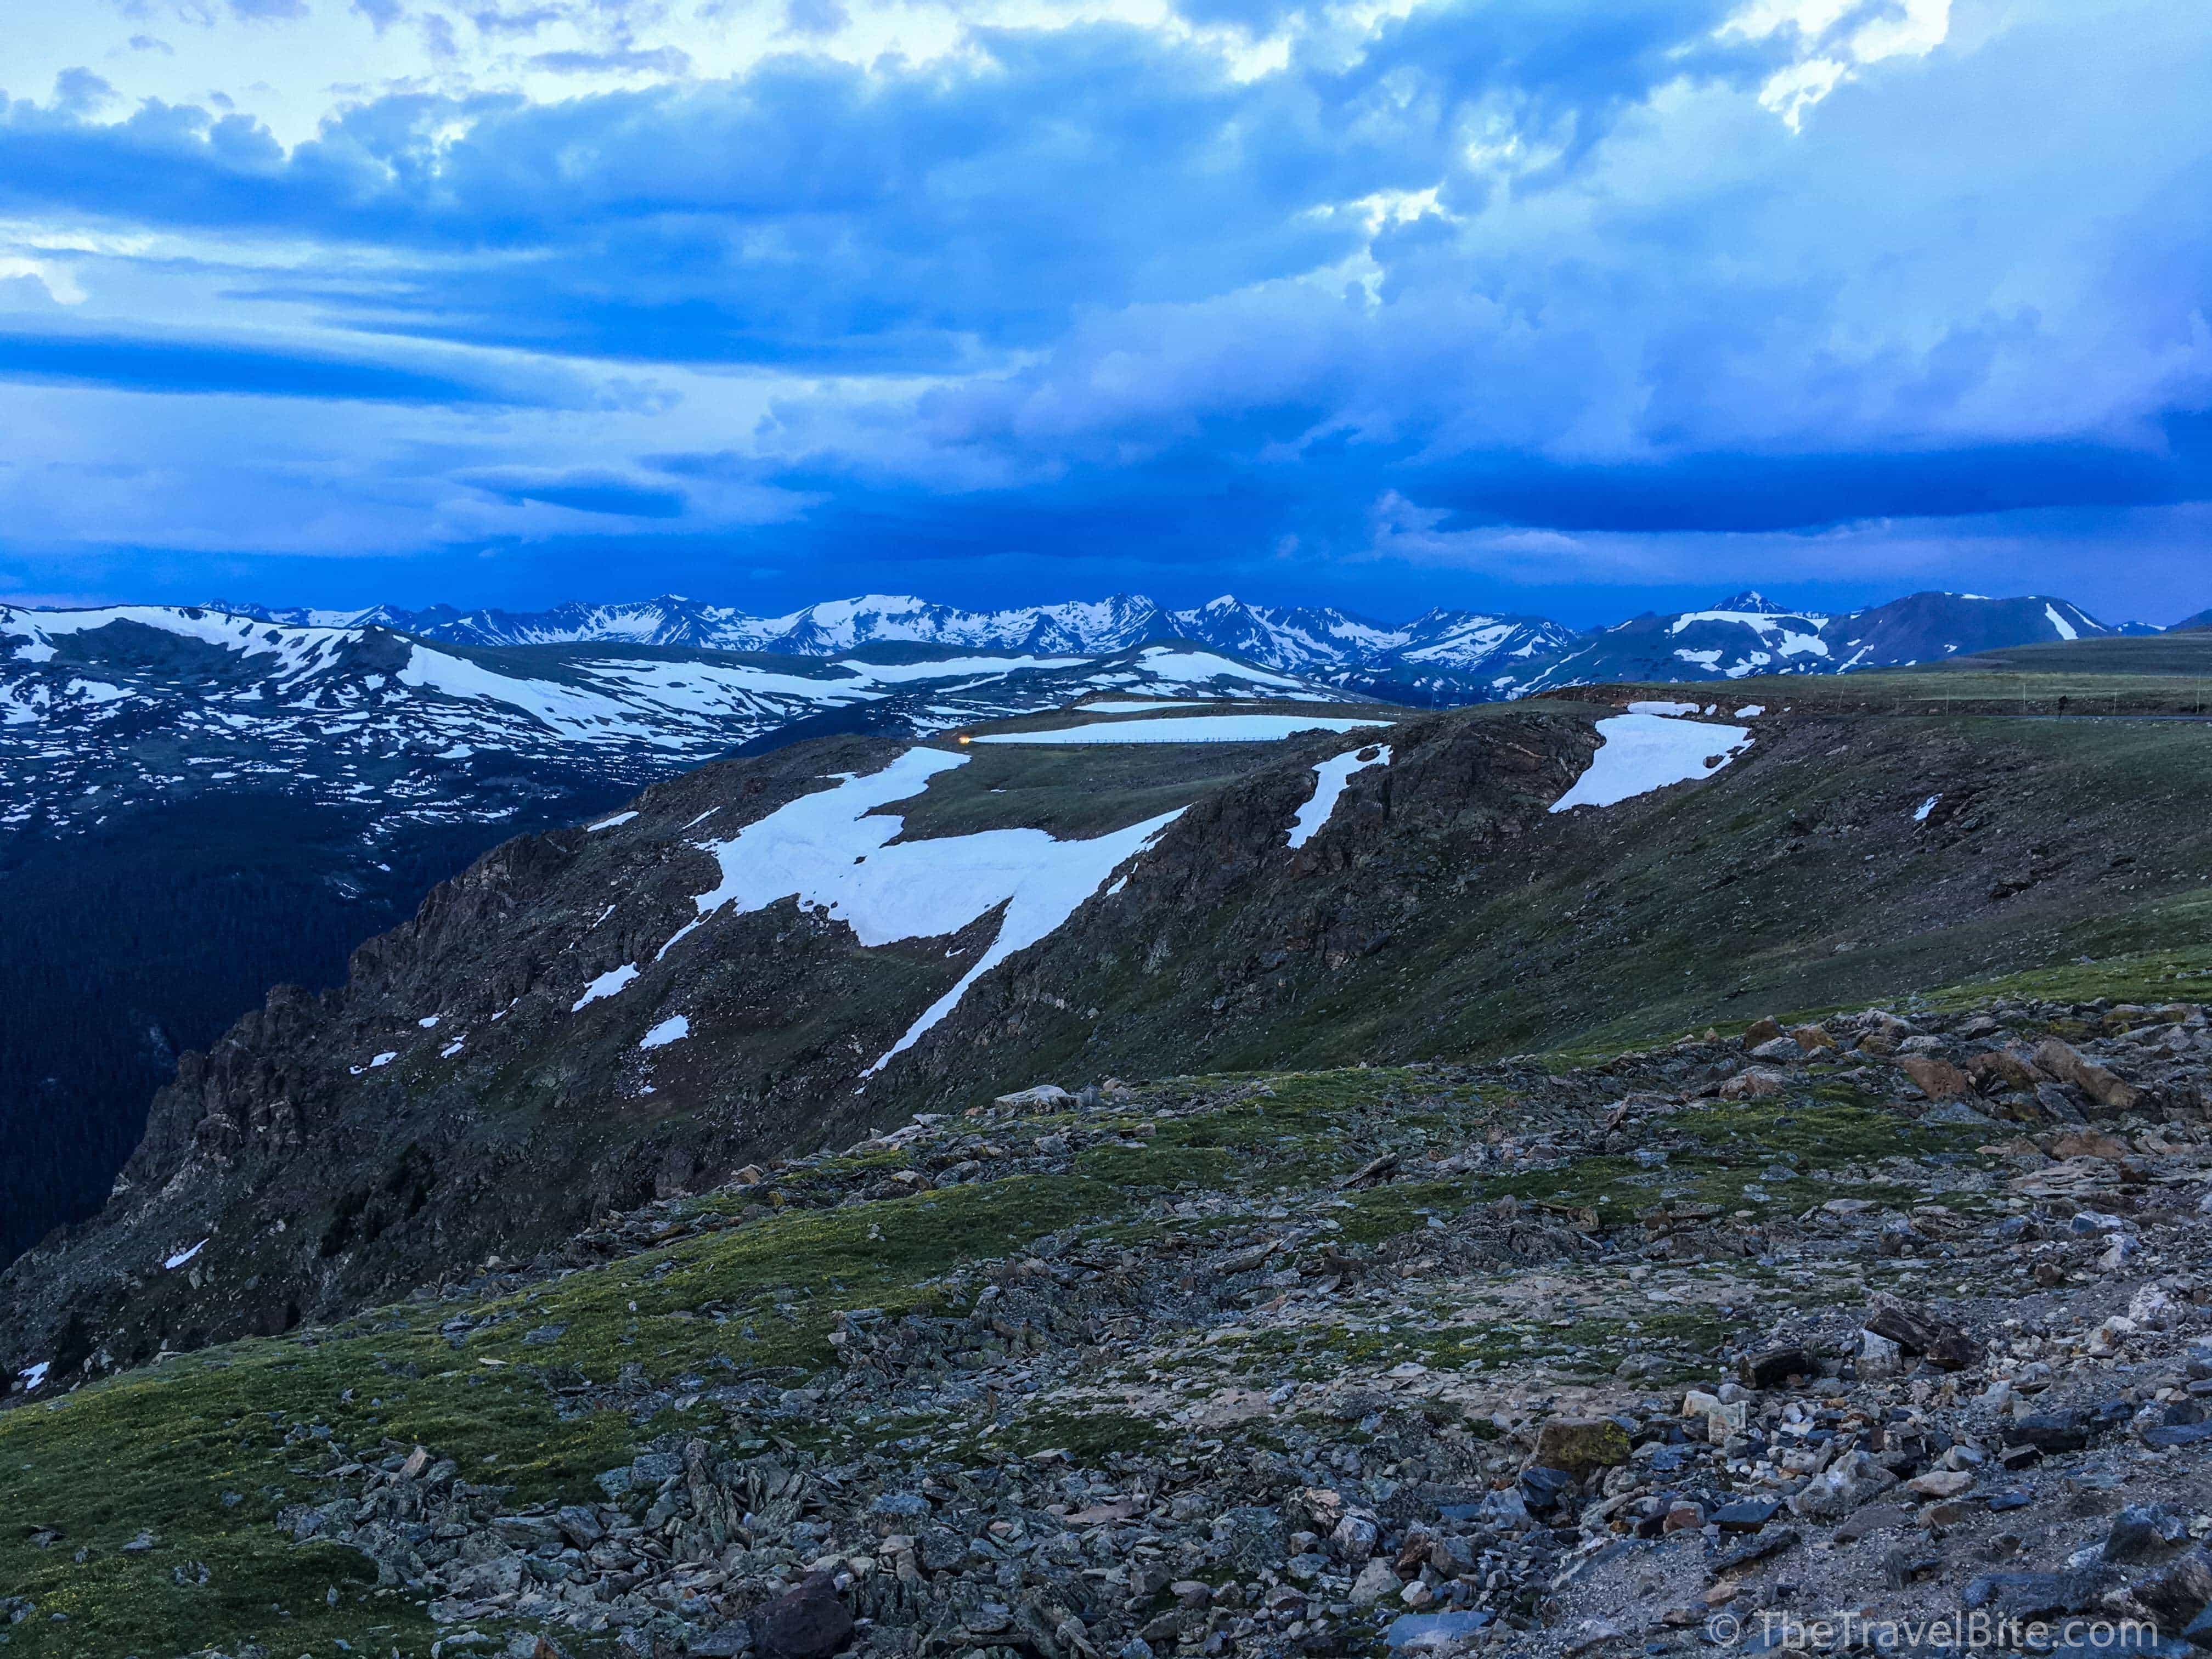 TheTravelBite_Colorado-94